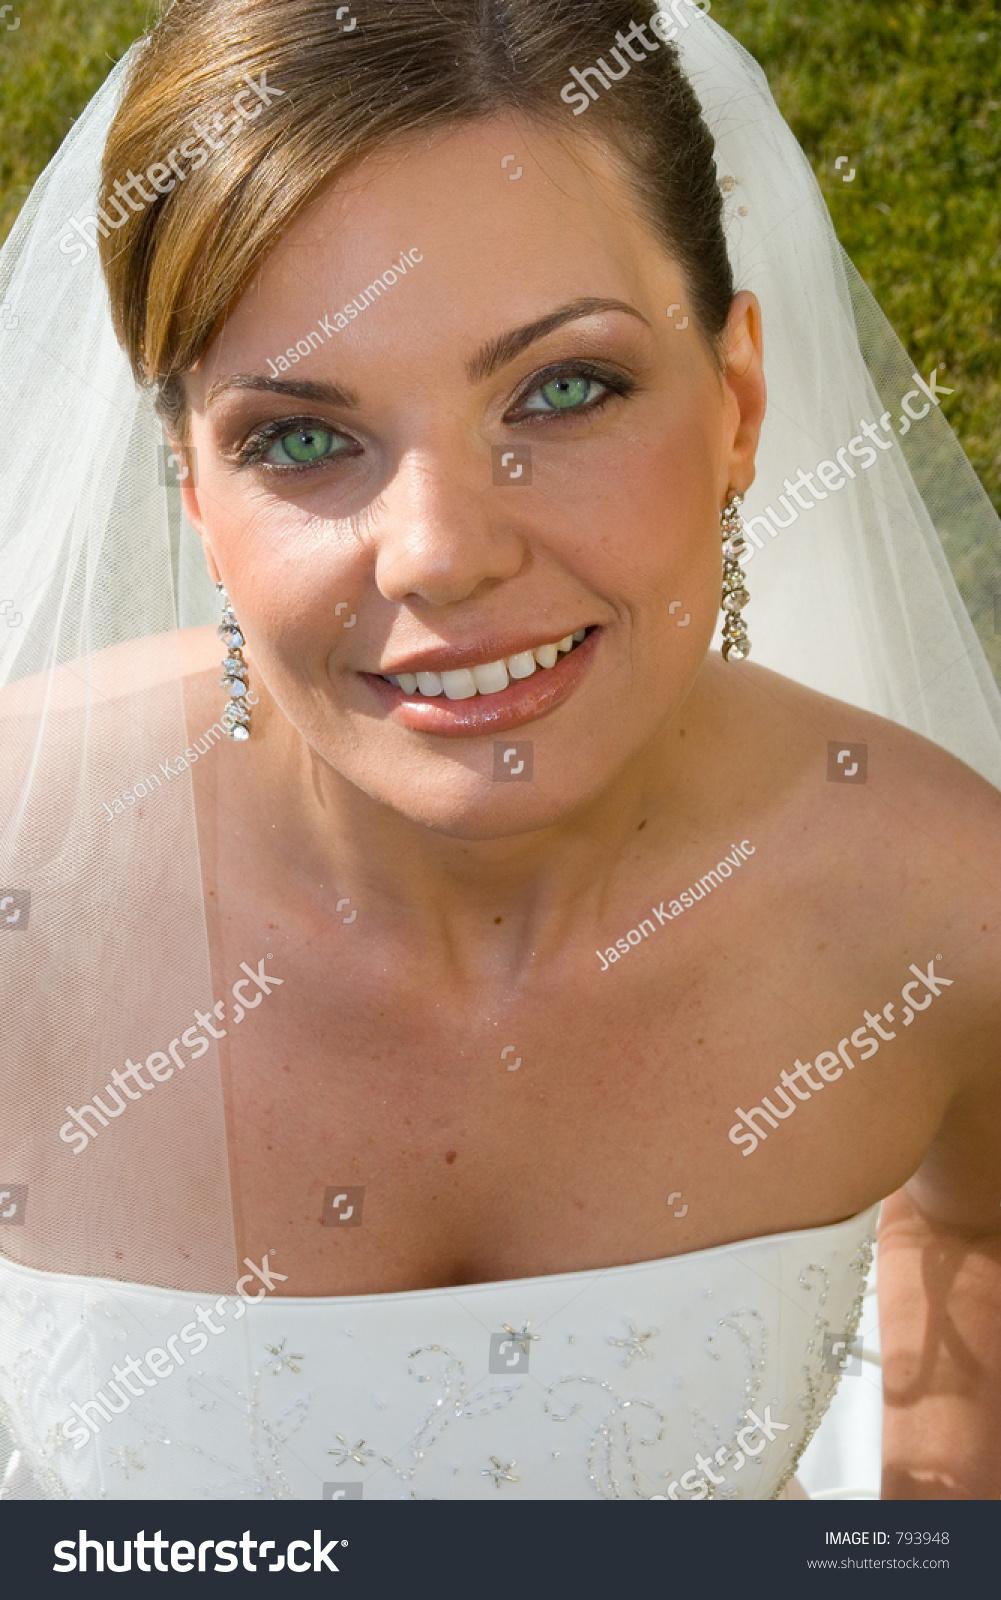 Photos Shutterstock Beautiful Bride Photos 16